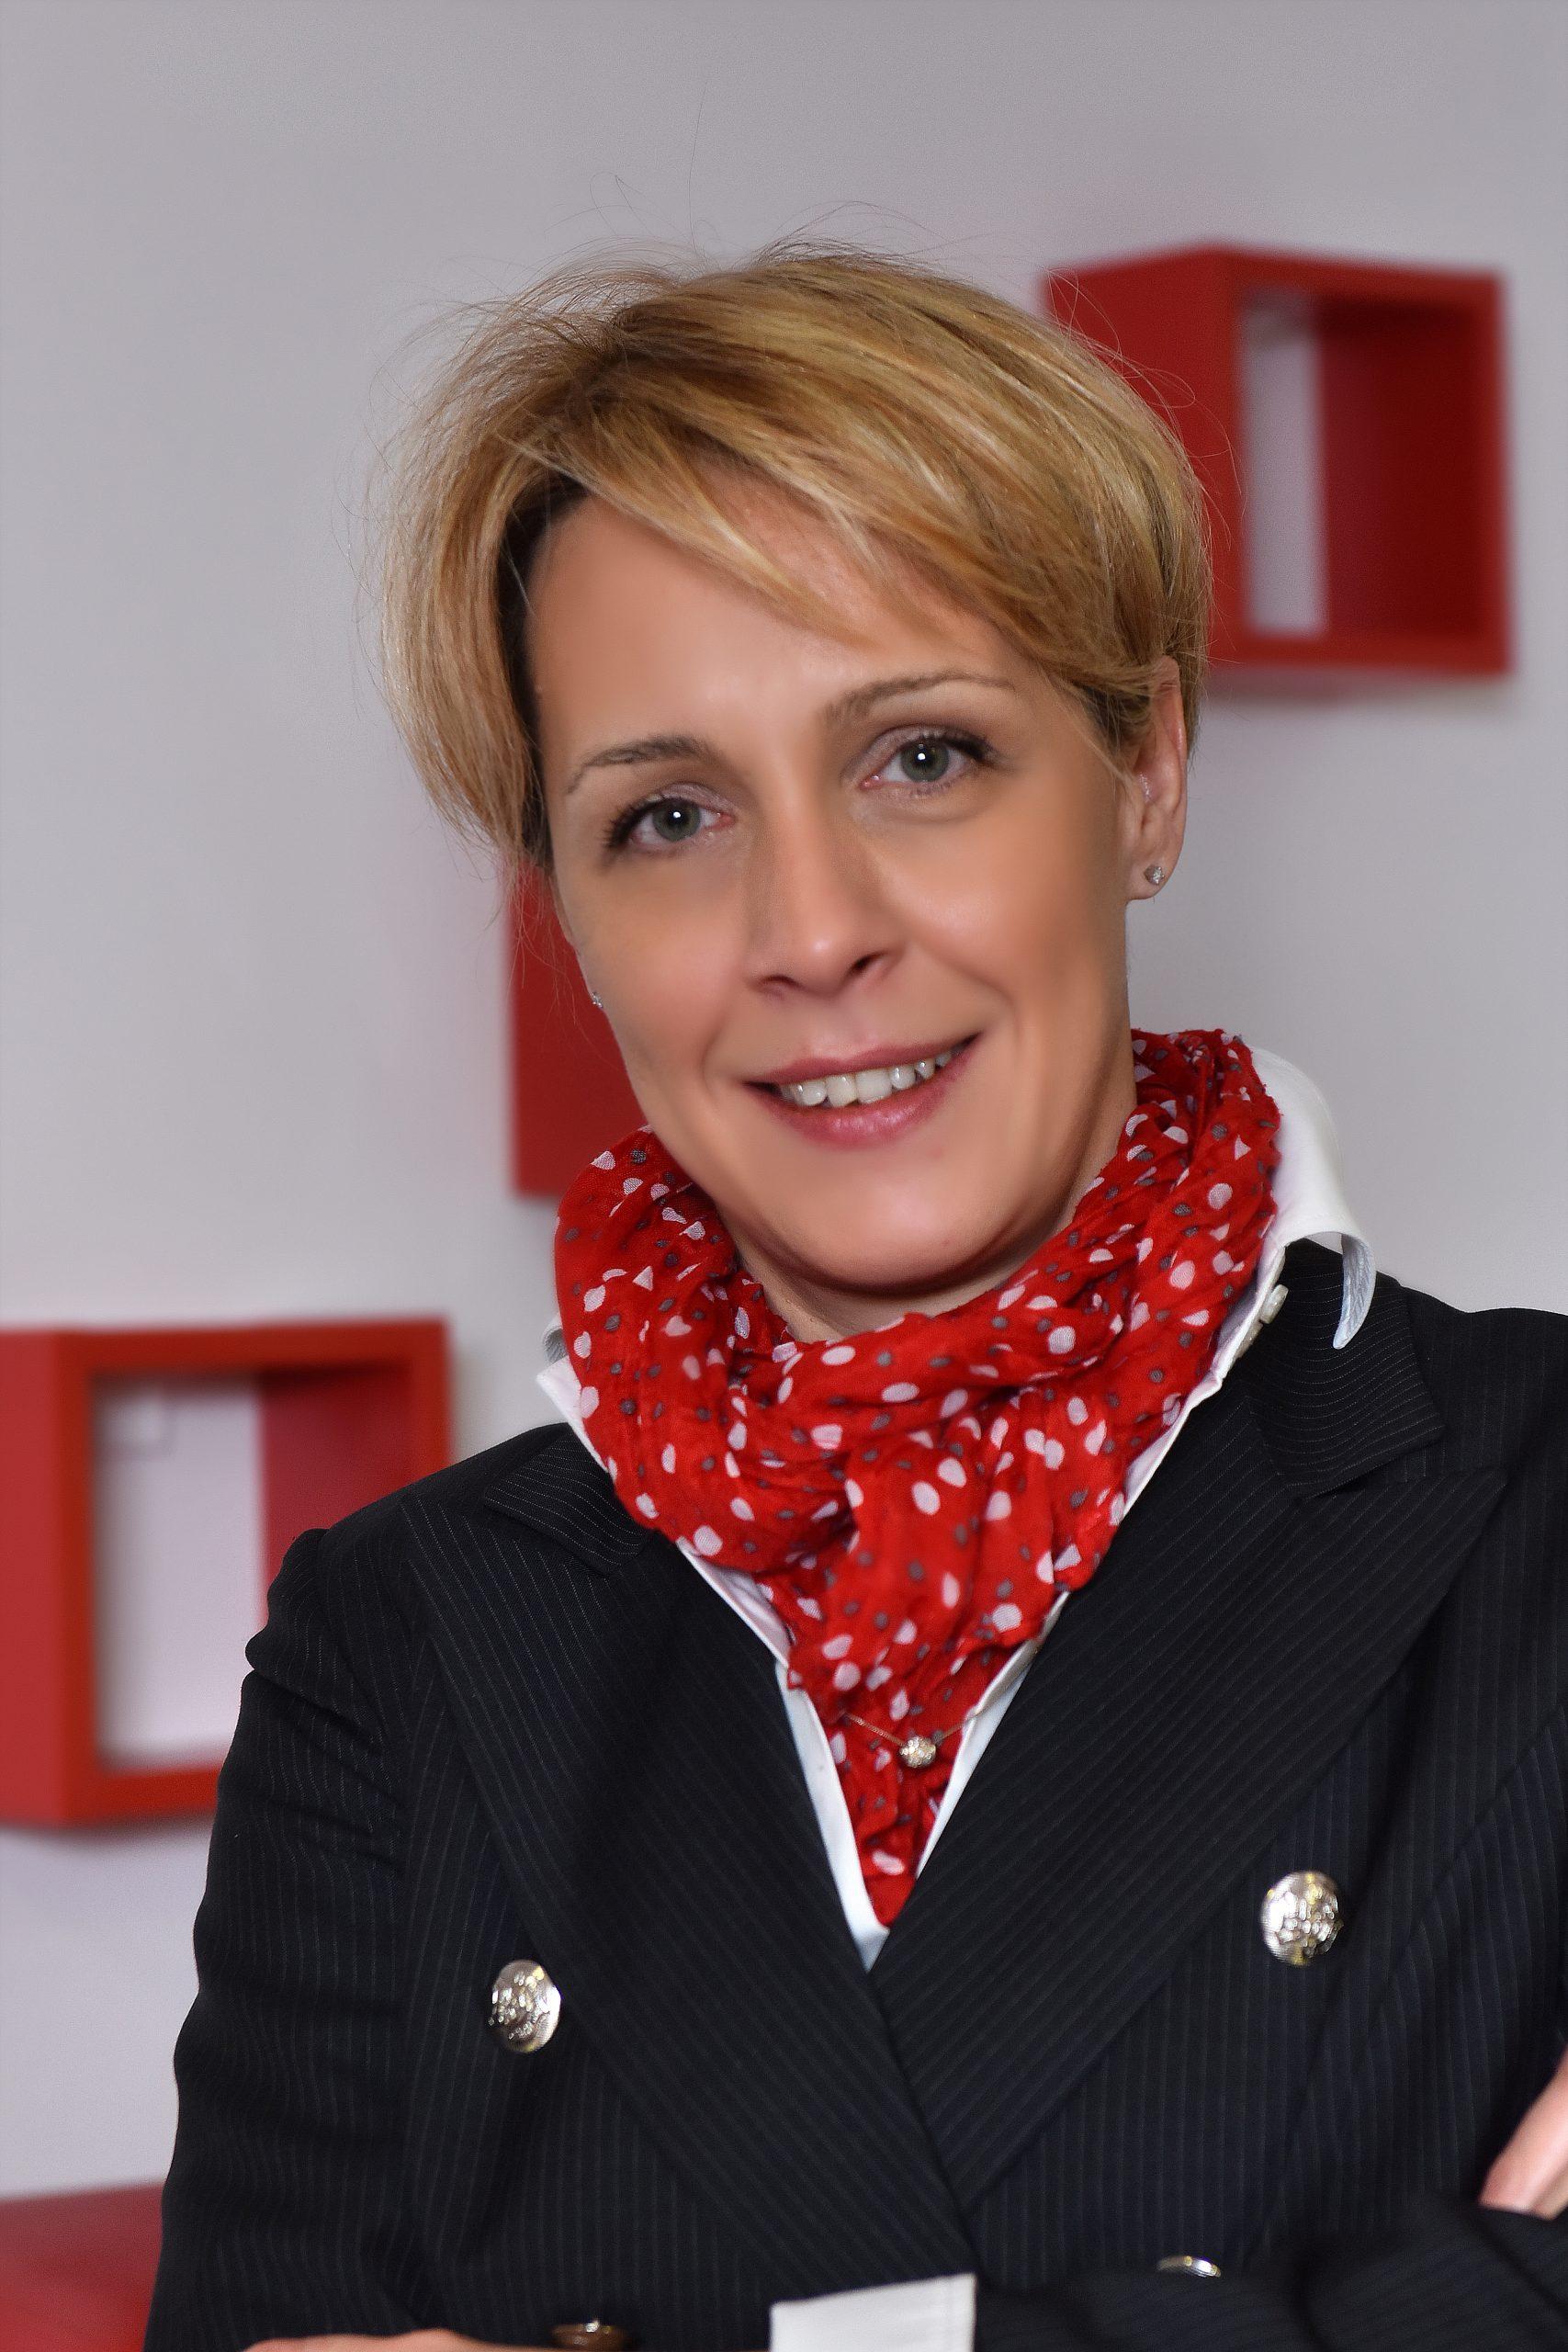 Ana Anđelković